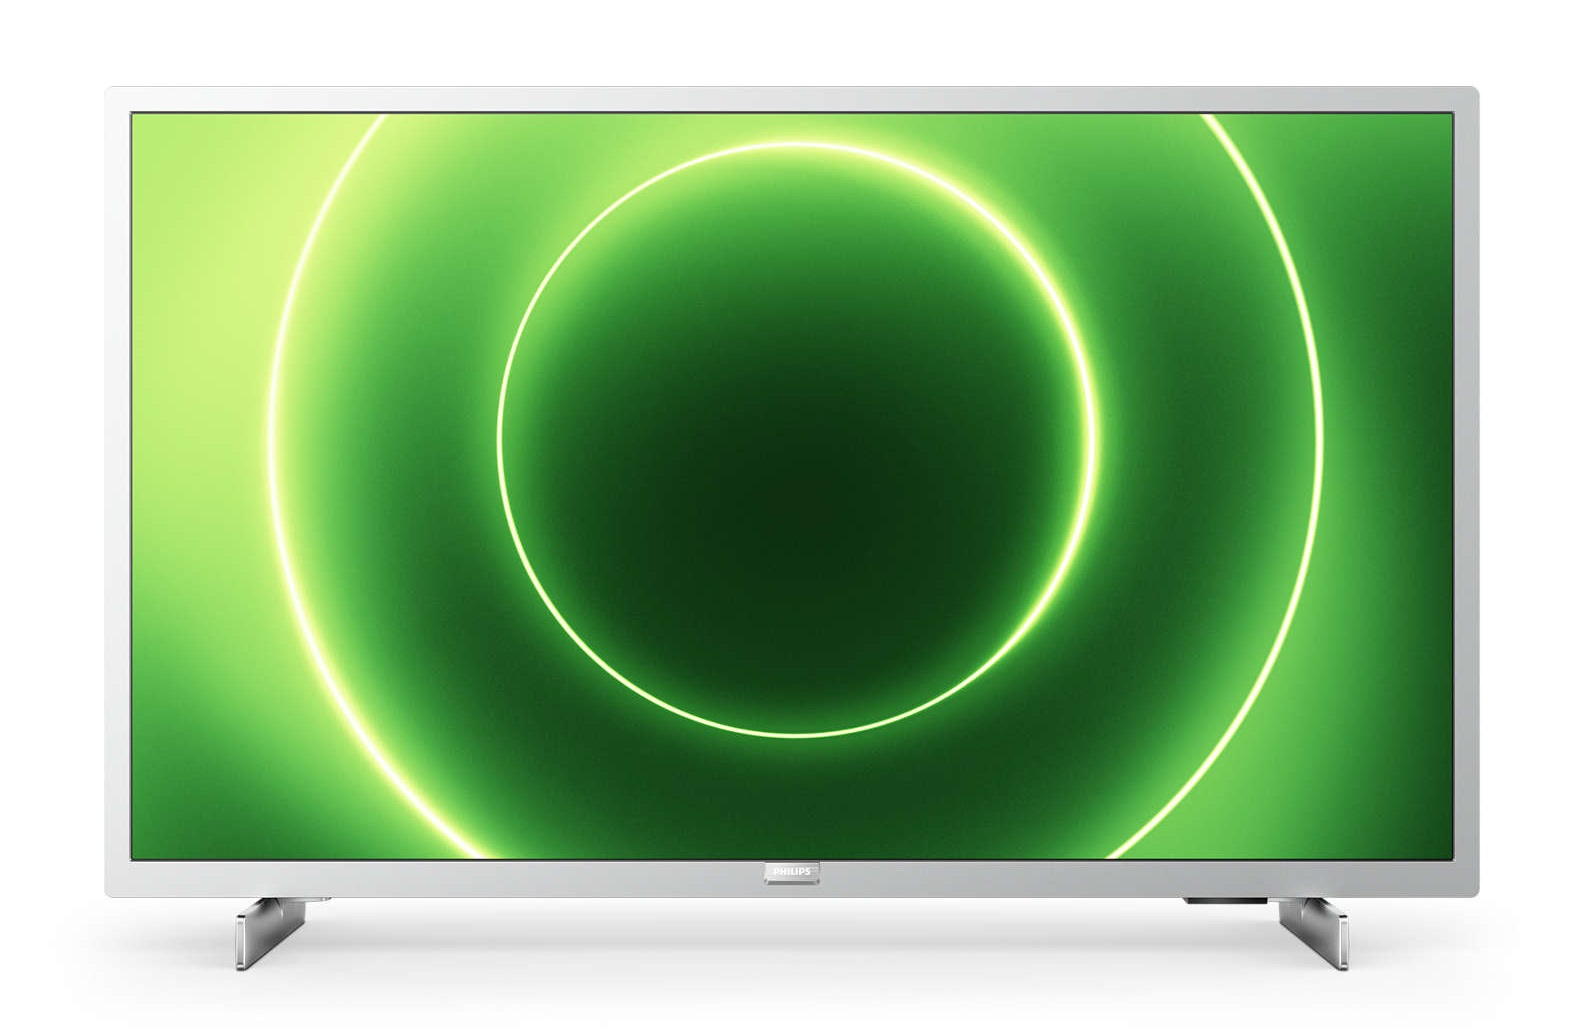 Philips LED televisie 32PFS6855/12